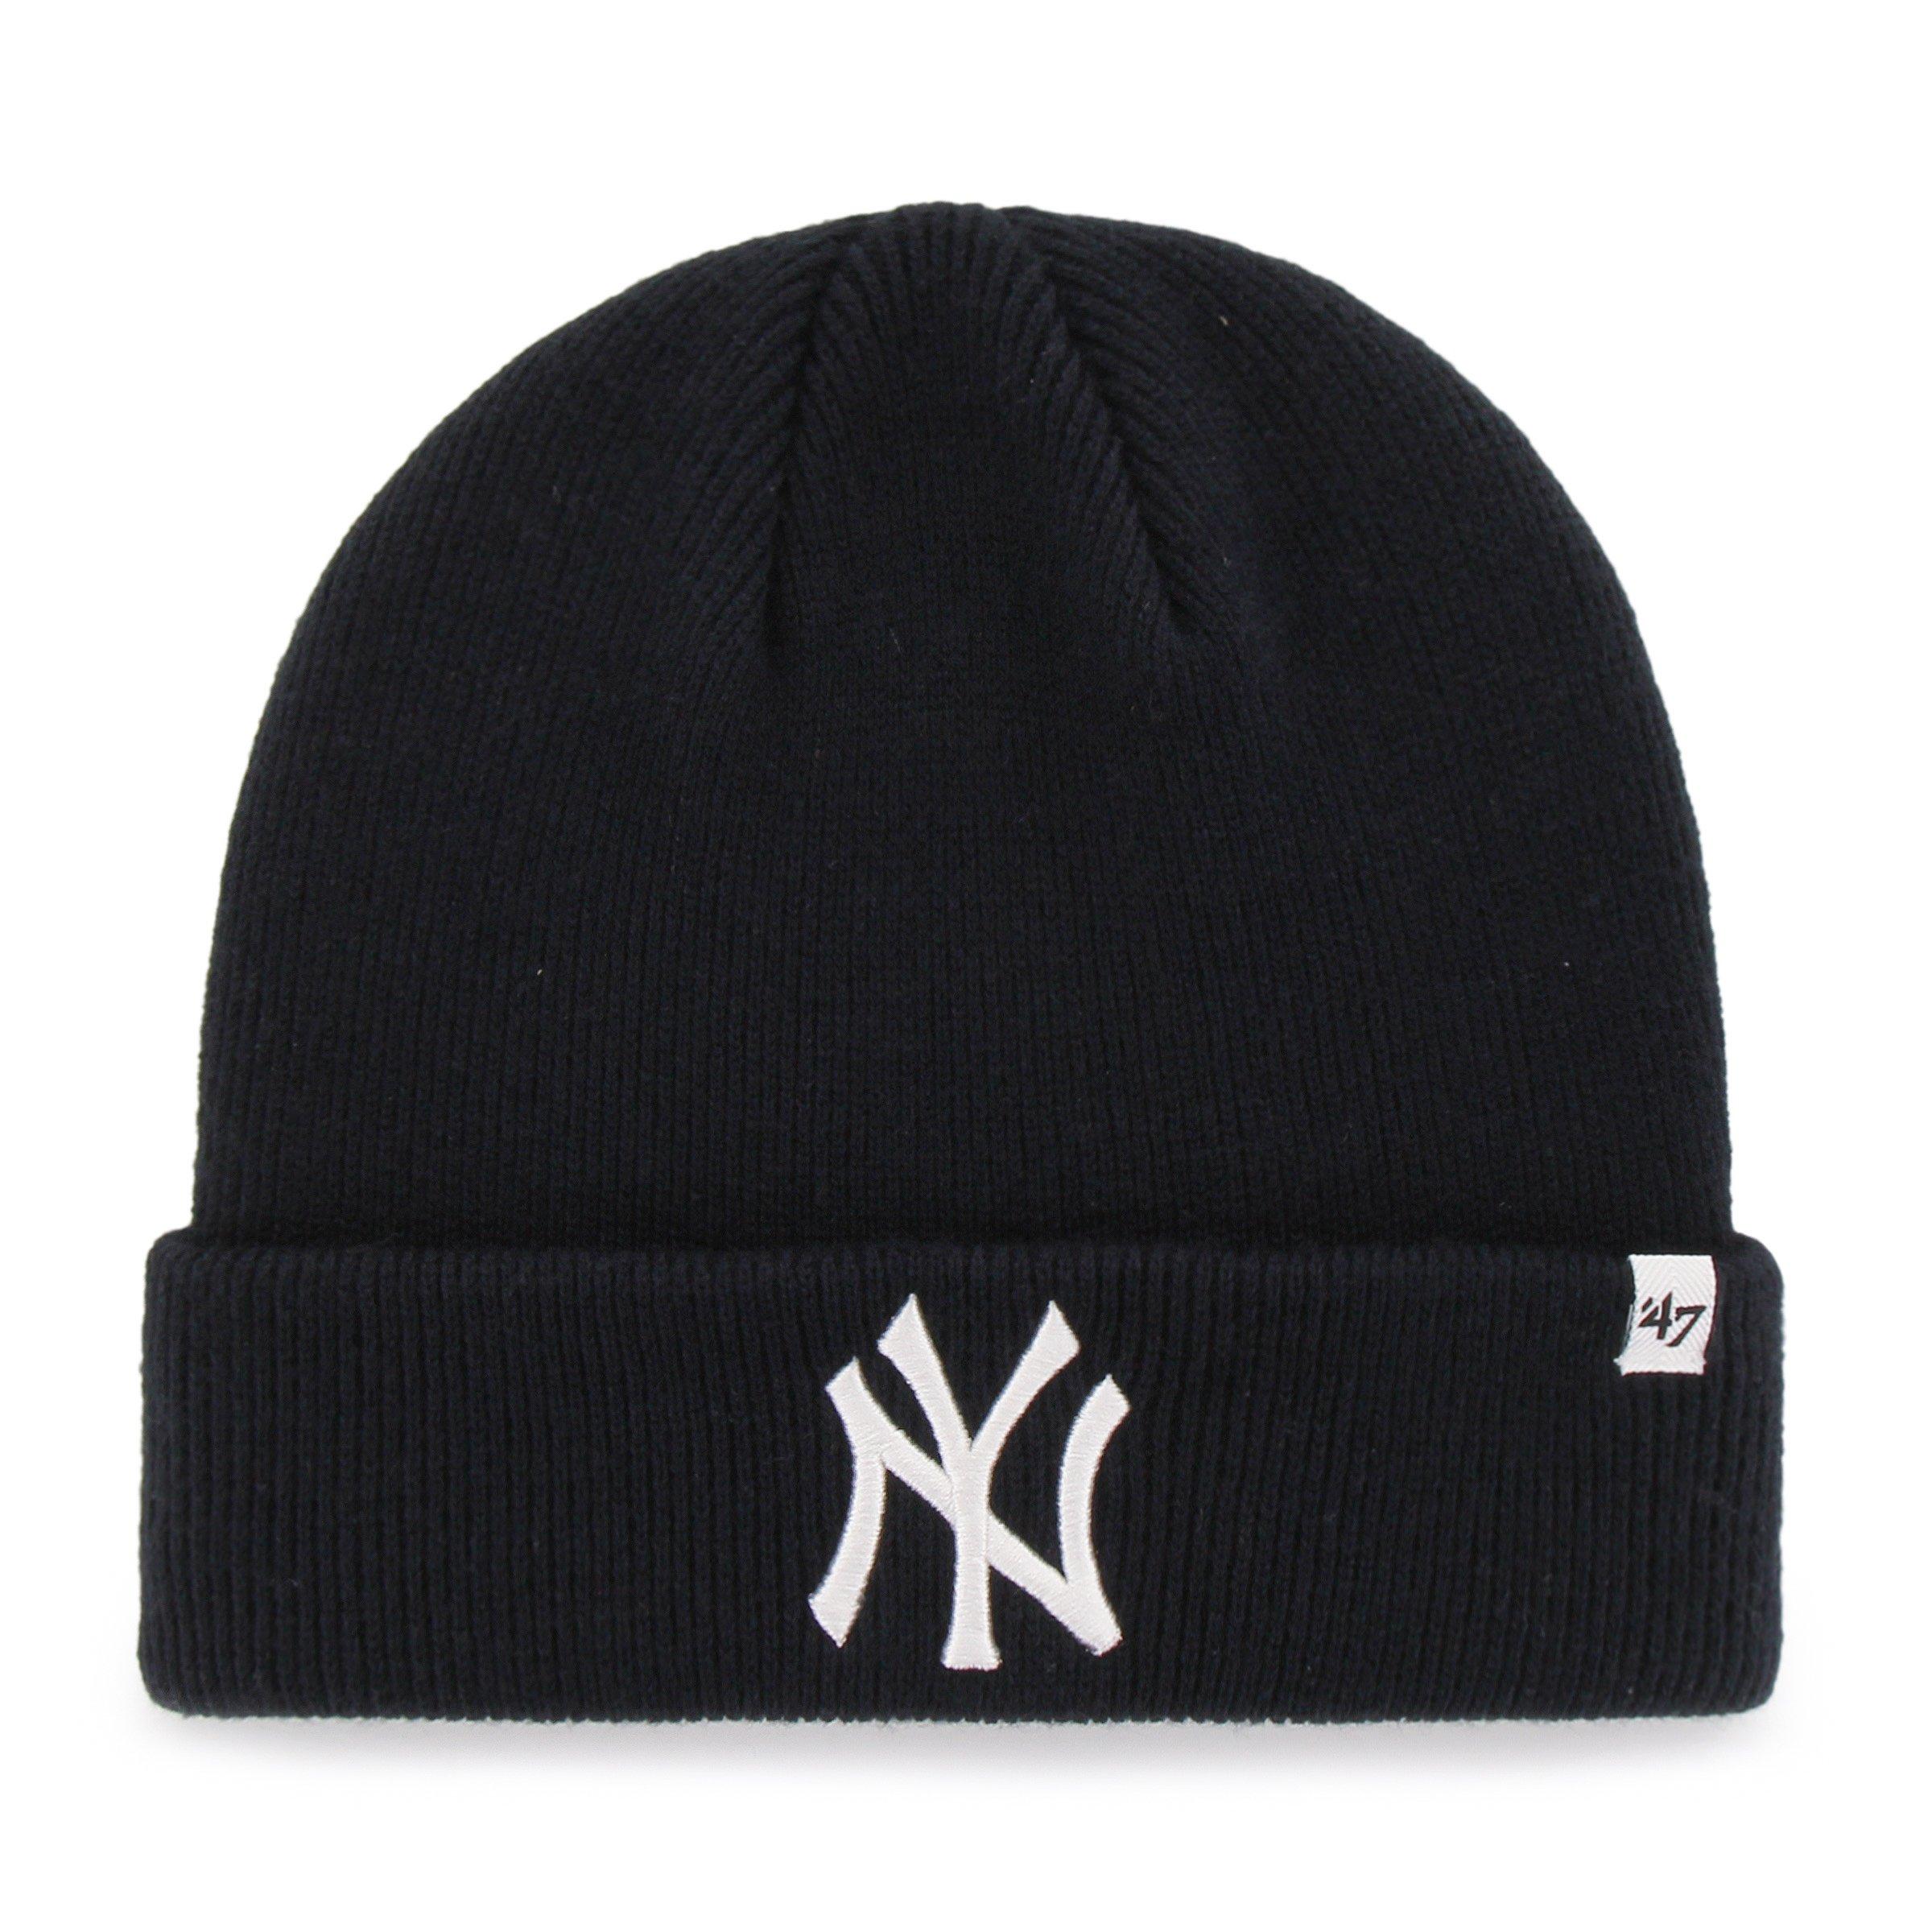 MLB New York Yankees '47 Raised Cuff Knit Hat, Navy, One Size